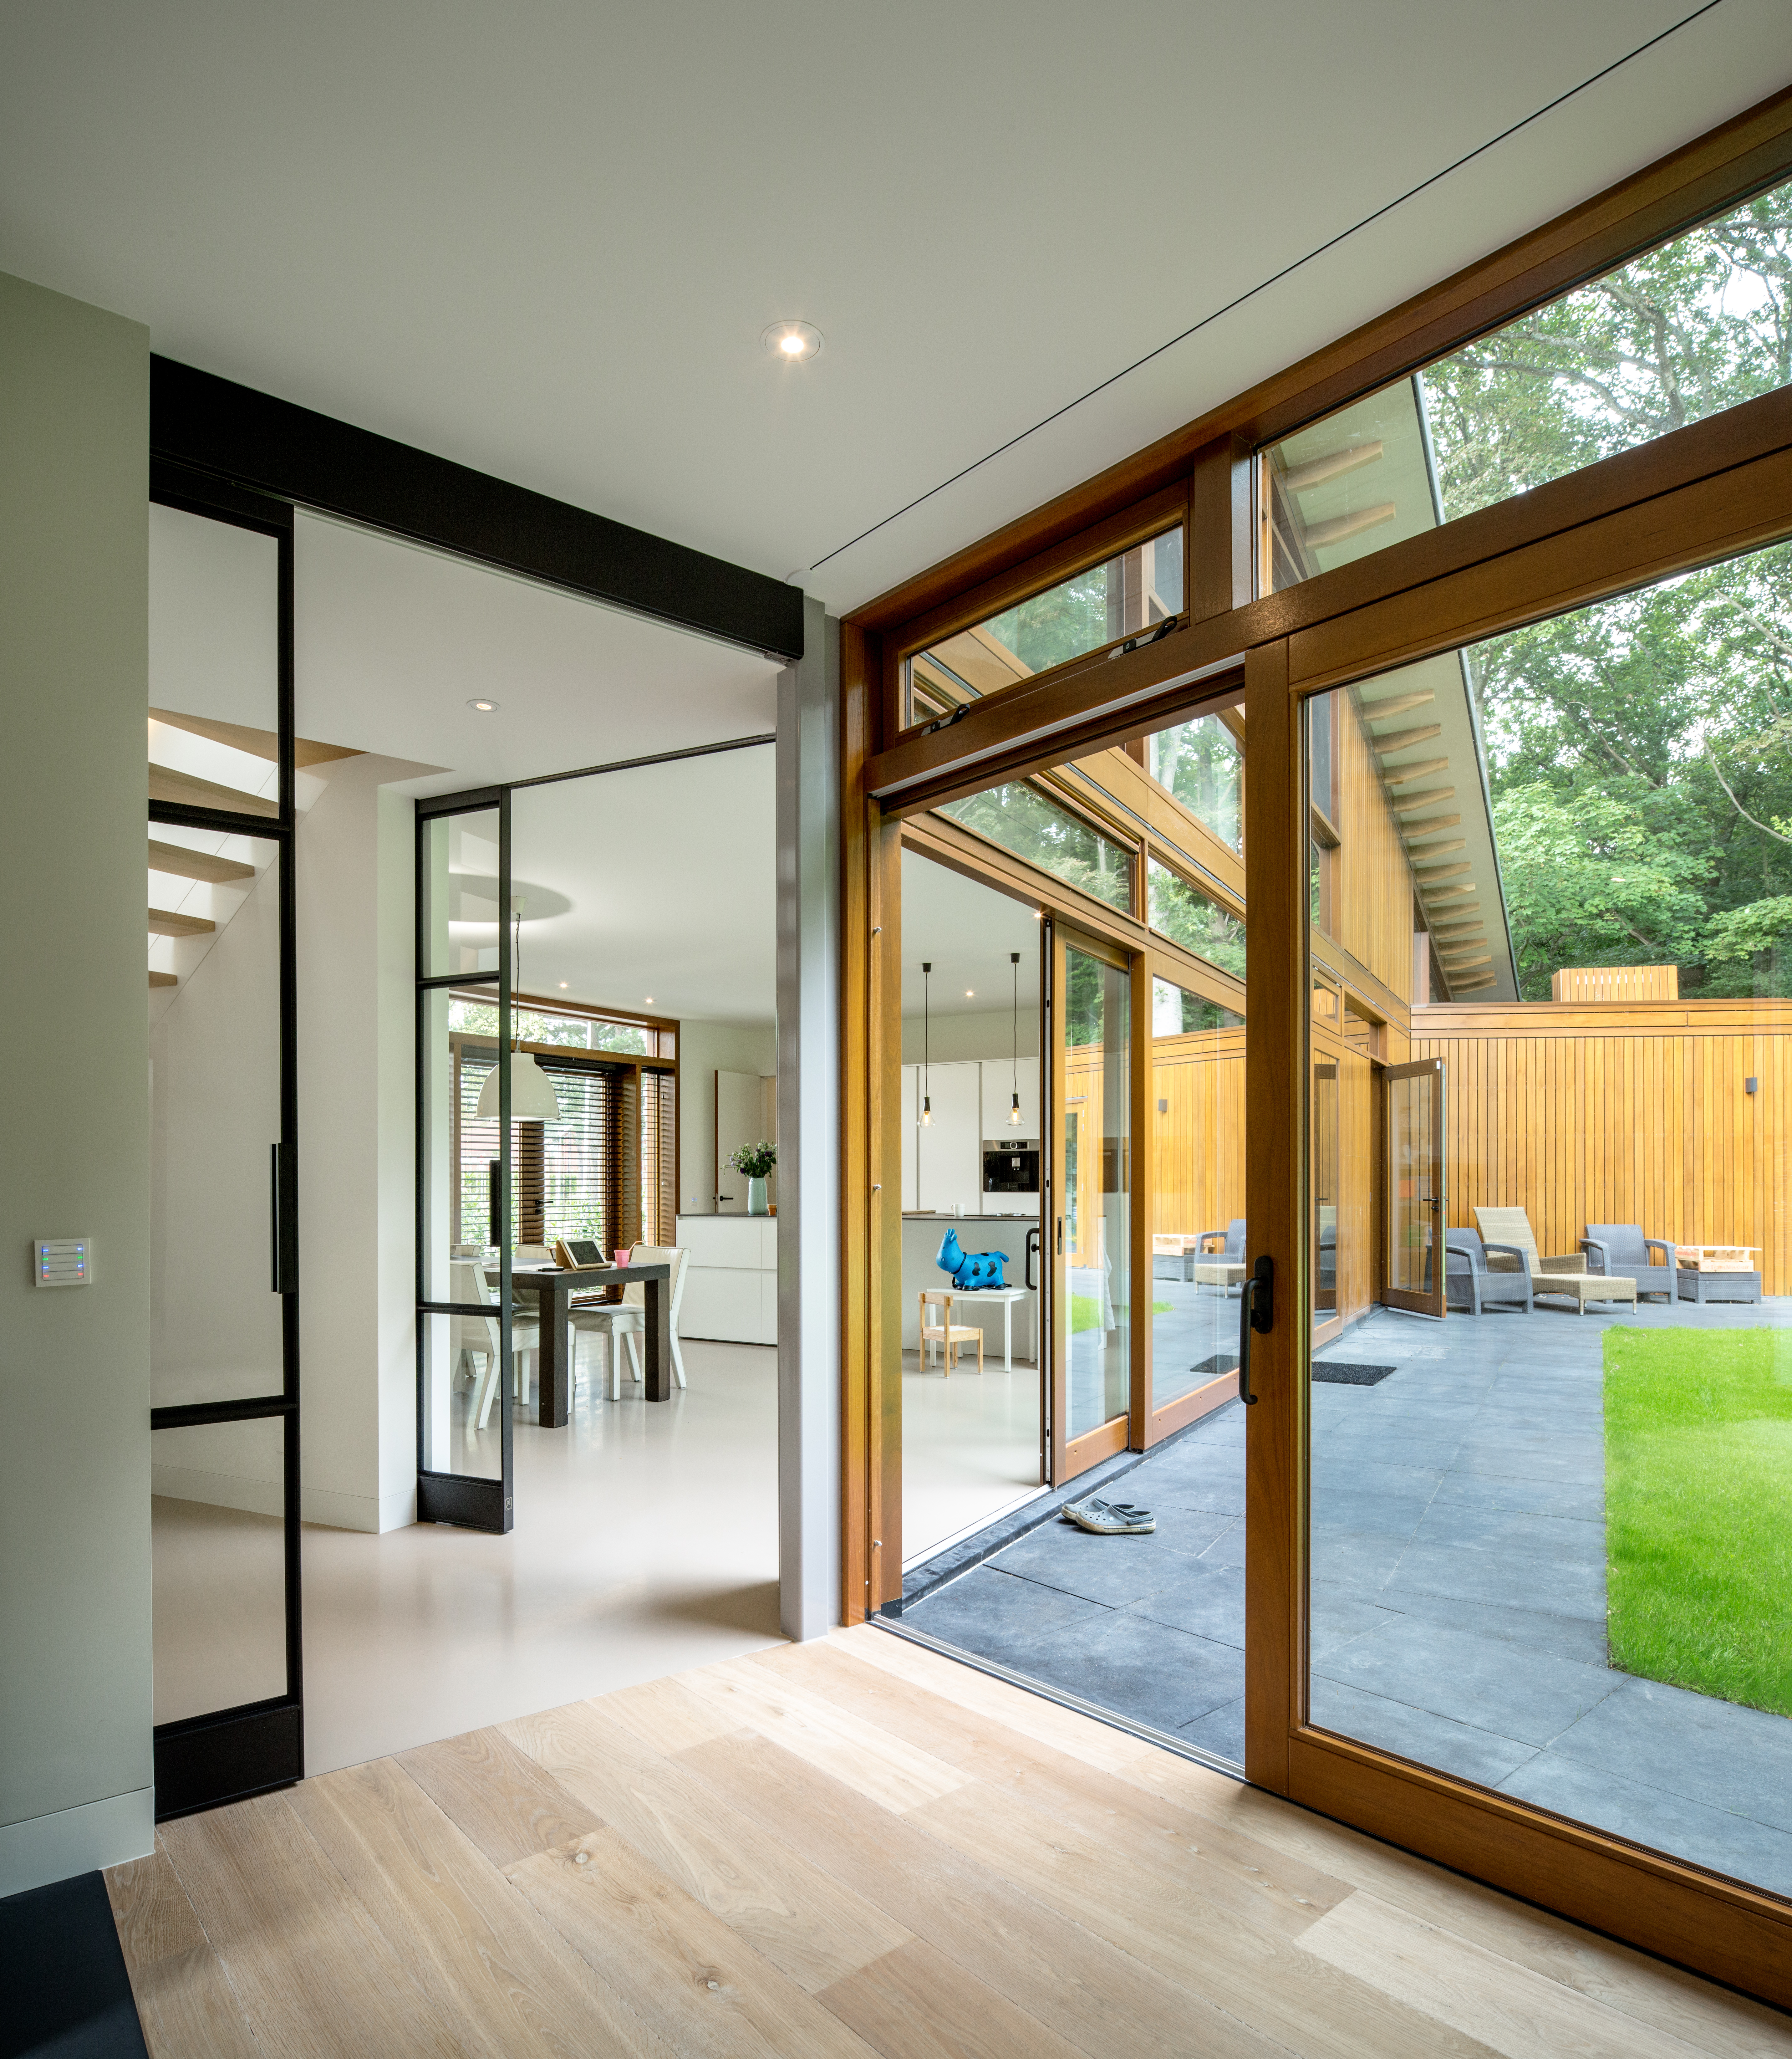 <p>Moke Architecten Gianni Cito Woonhuis Bochem woonkamer-keuken HR</p>